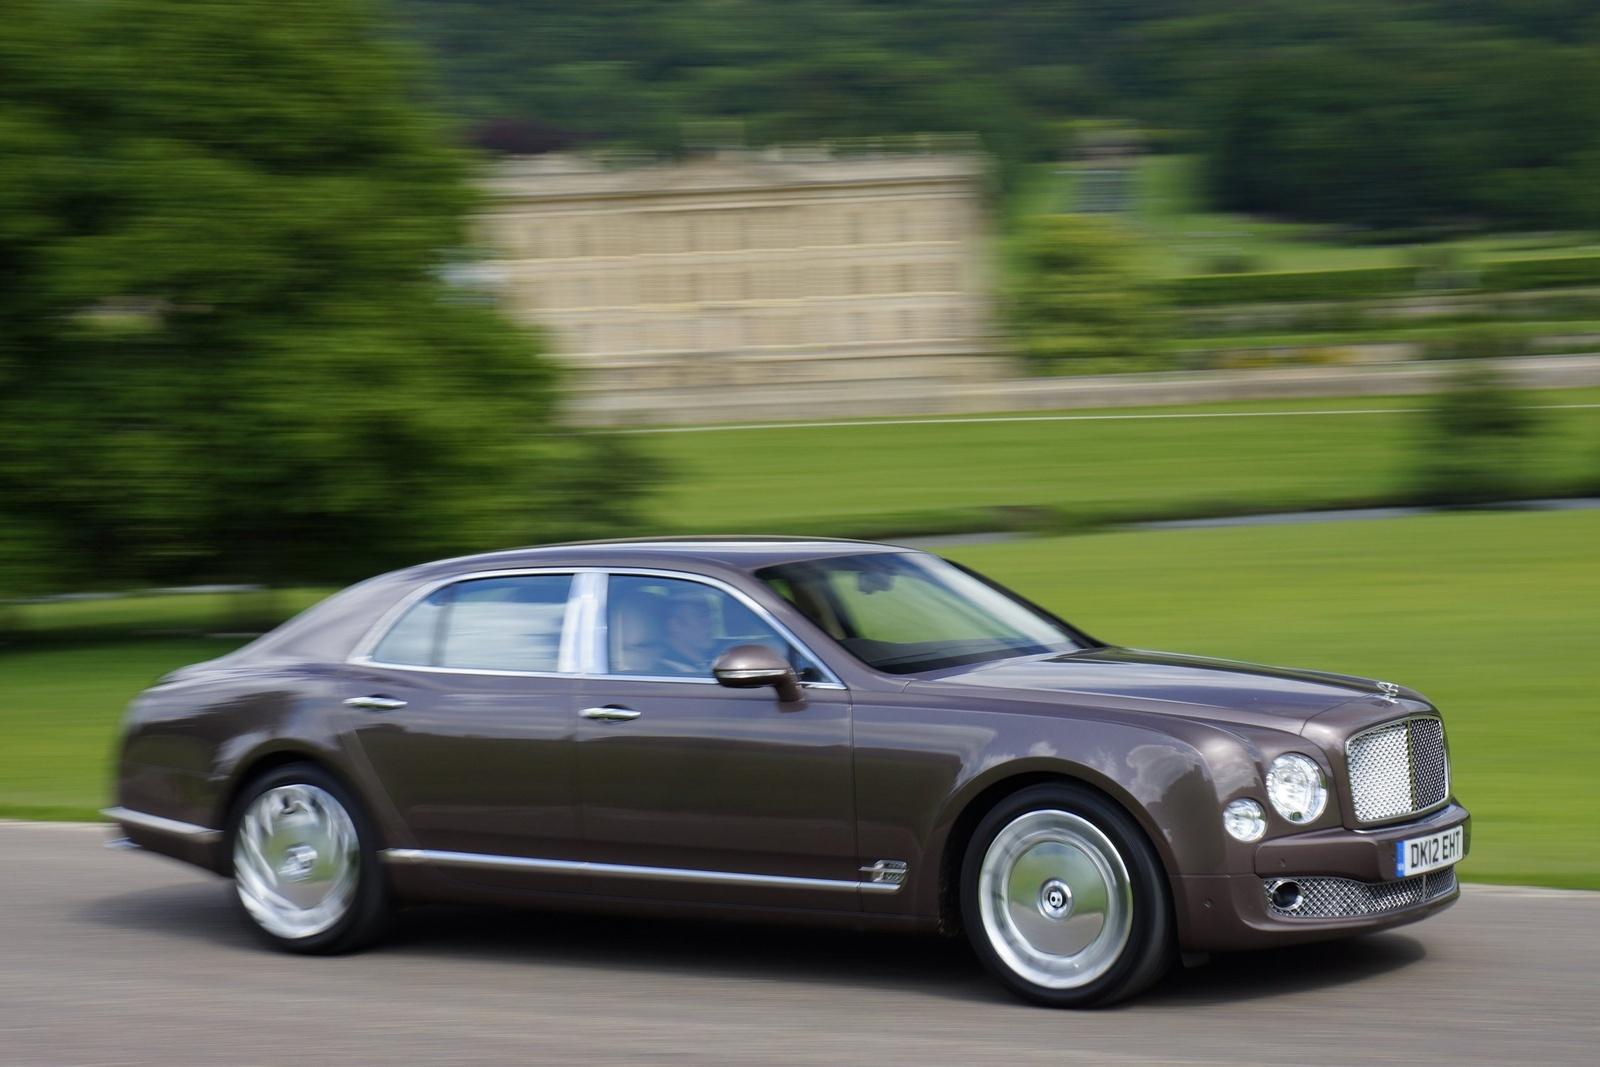 2013 Bentley Mulsanne - Overview - CarGurus